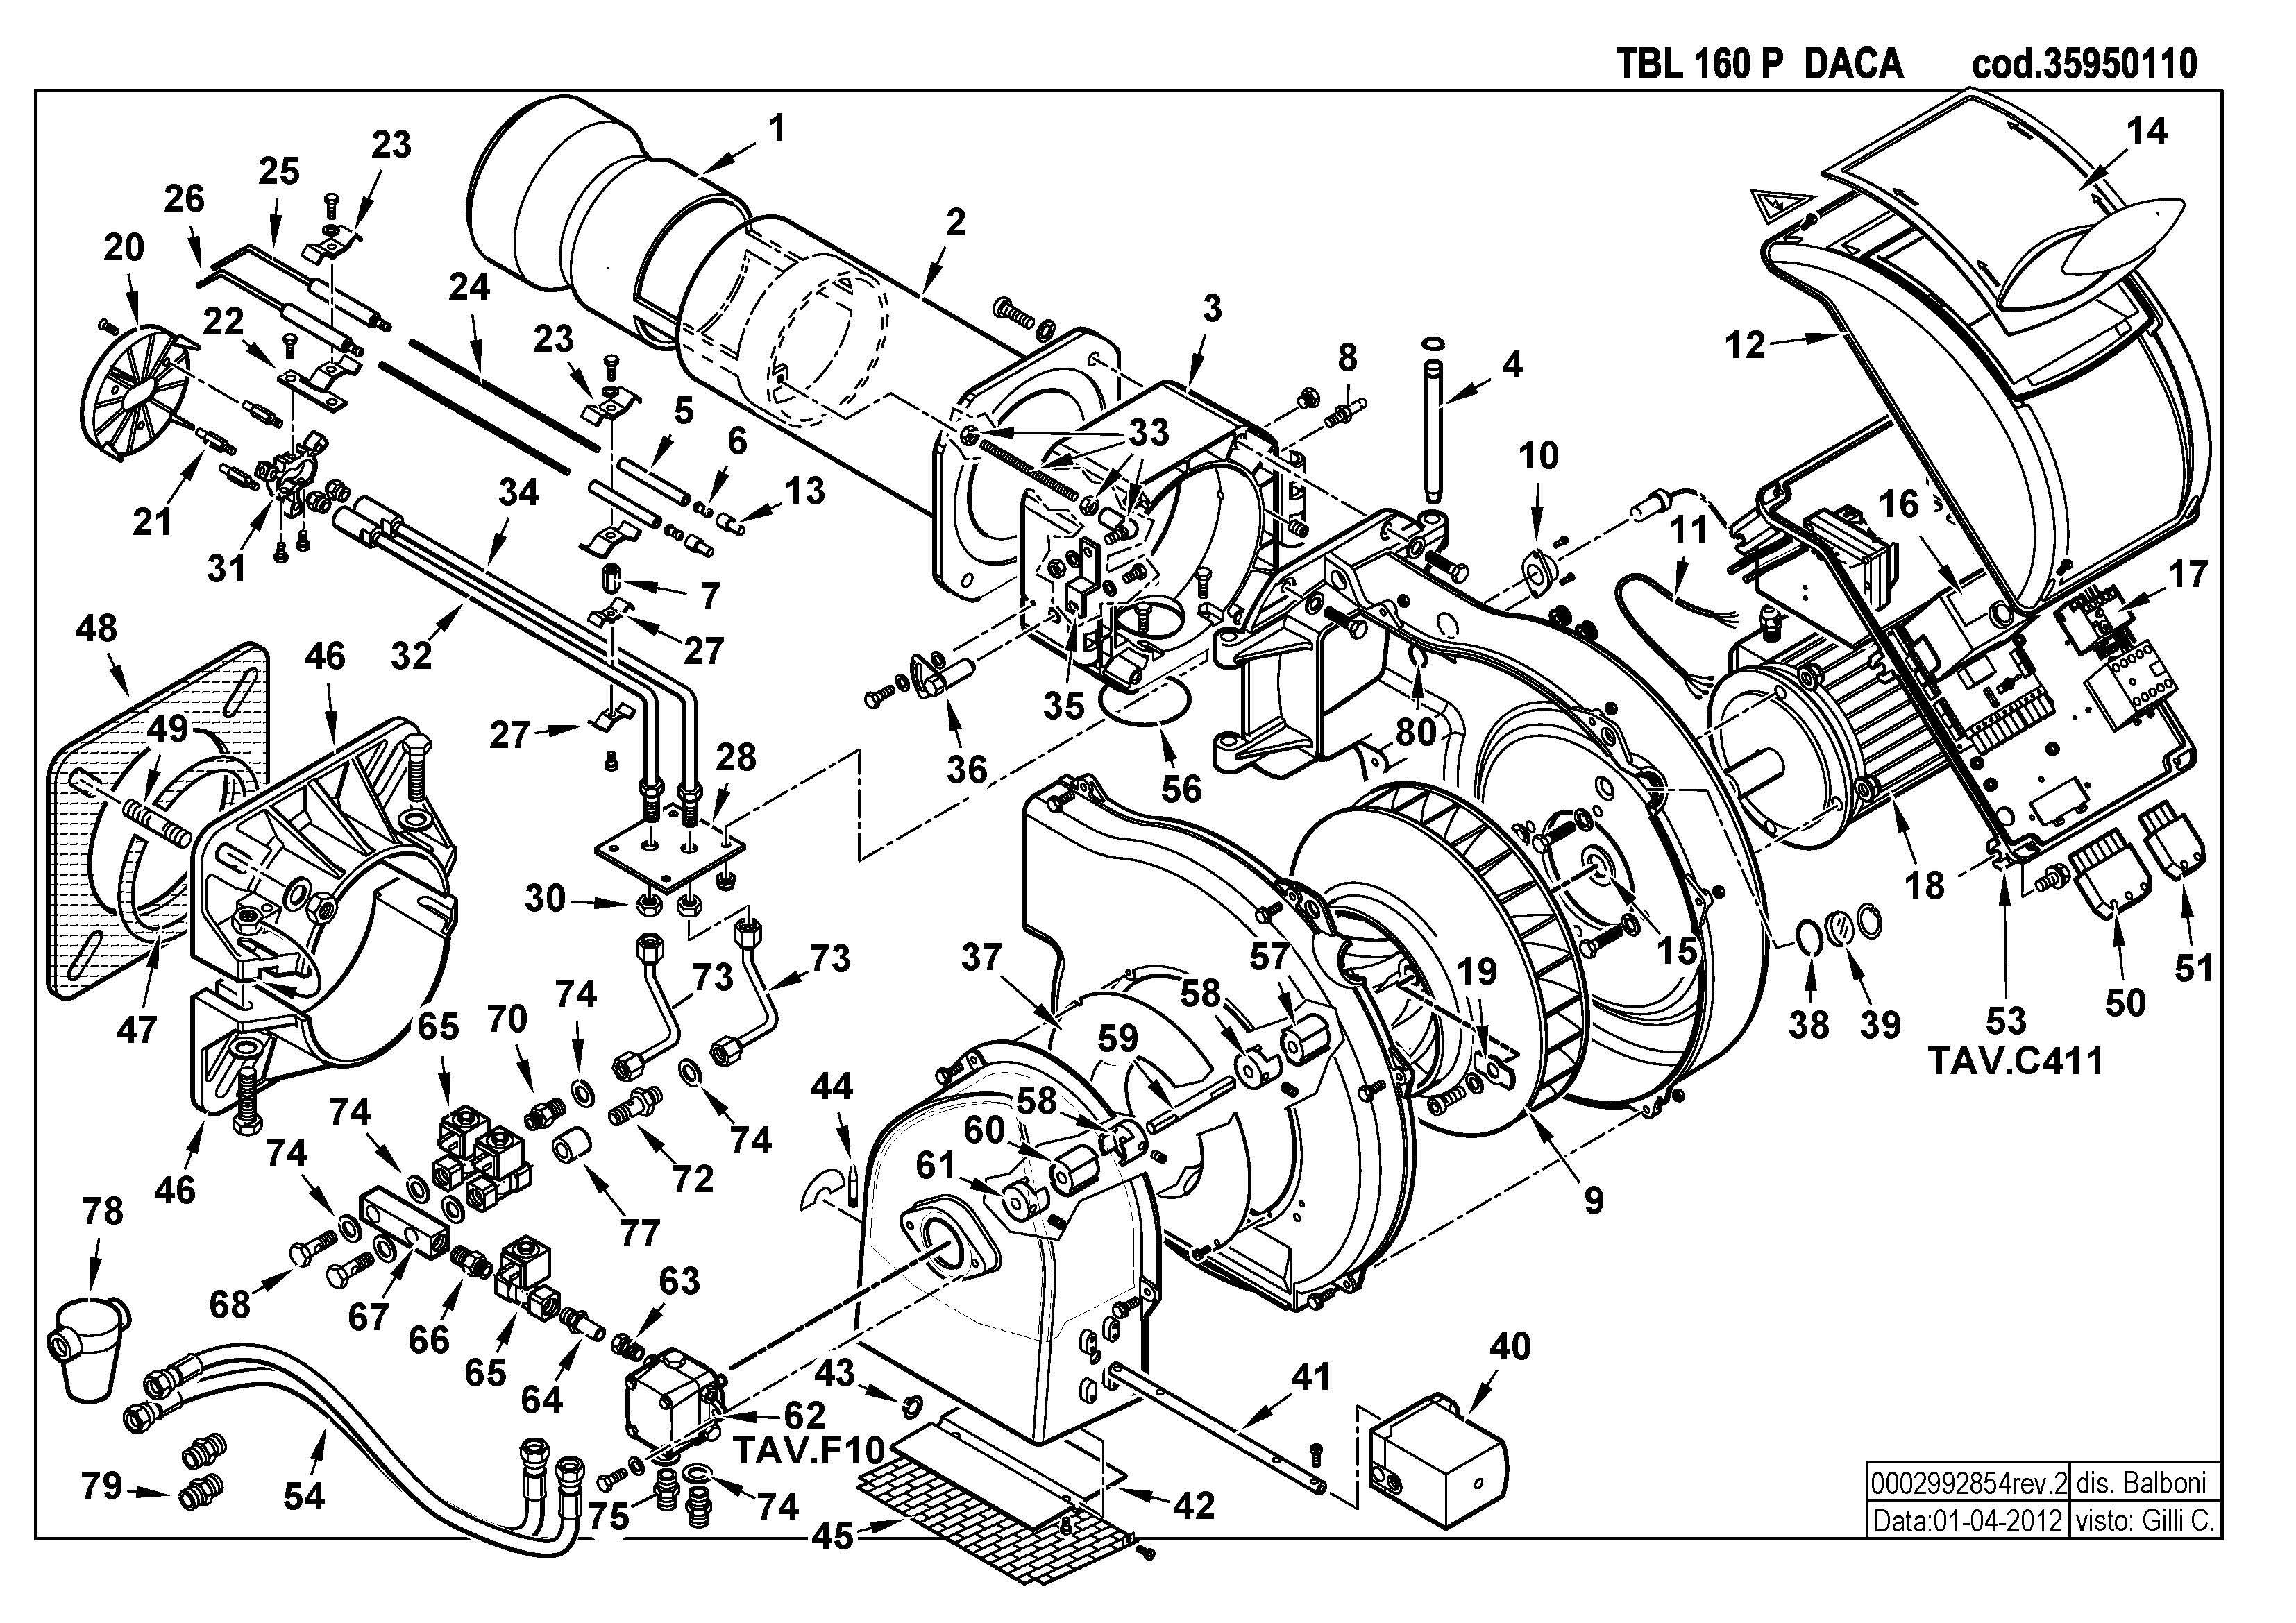 TBL 160 P DACA 35950110 2 20120401